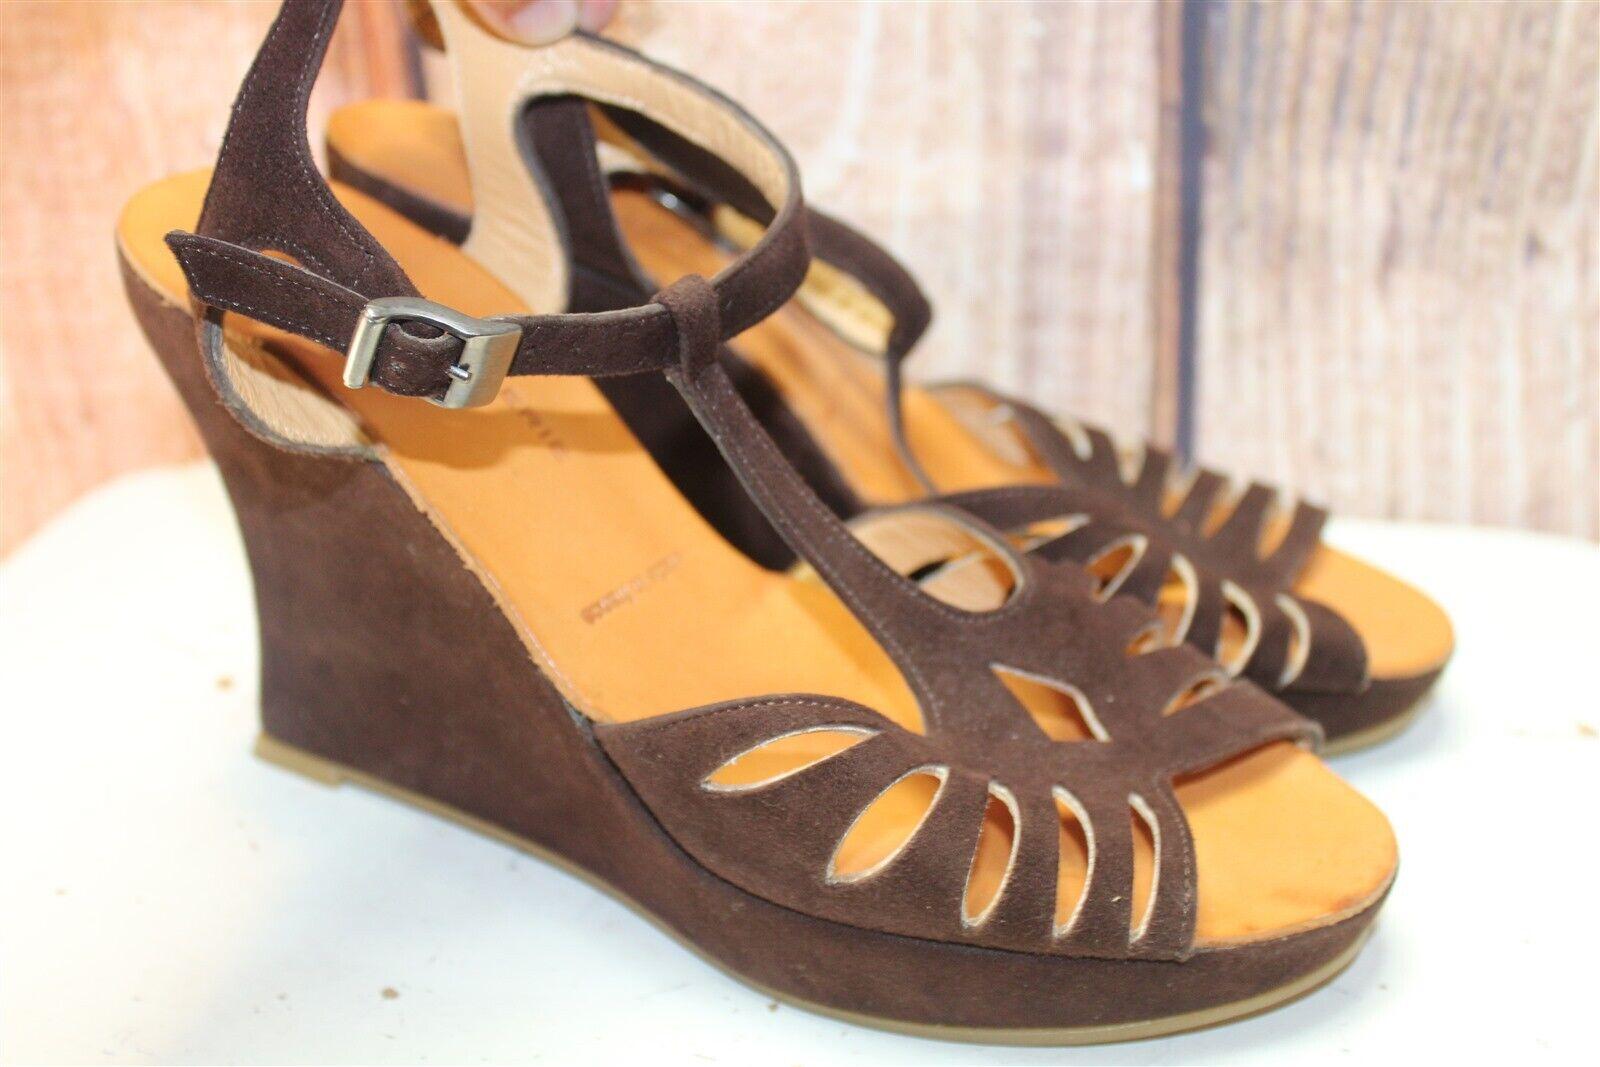 Robert Clergrie Paris Brown Suede Wedge Sandals 7 B Women's shoes